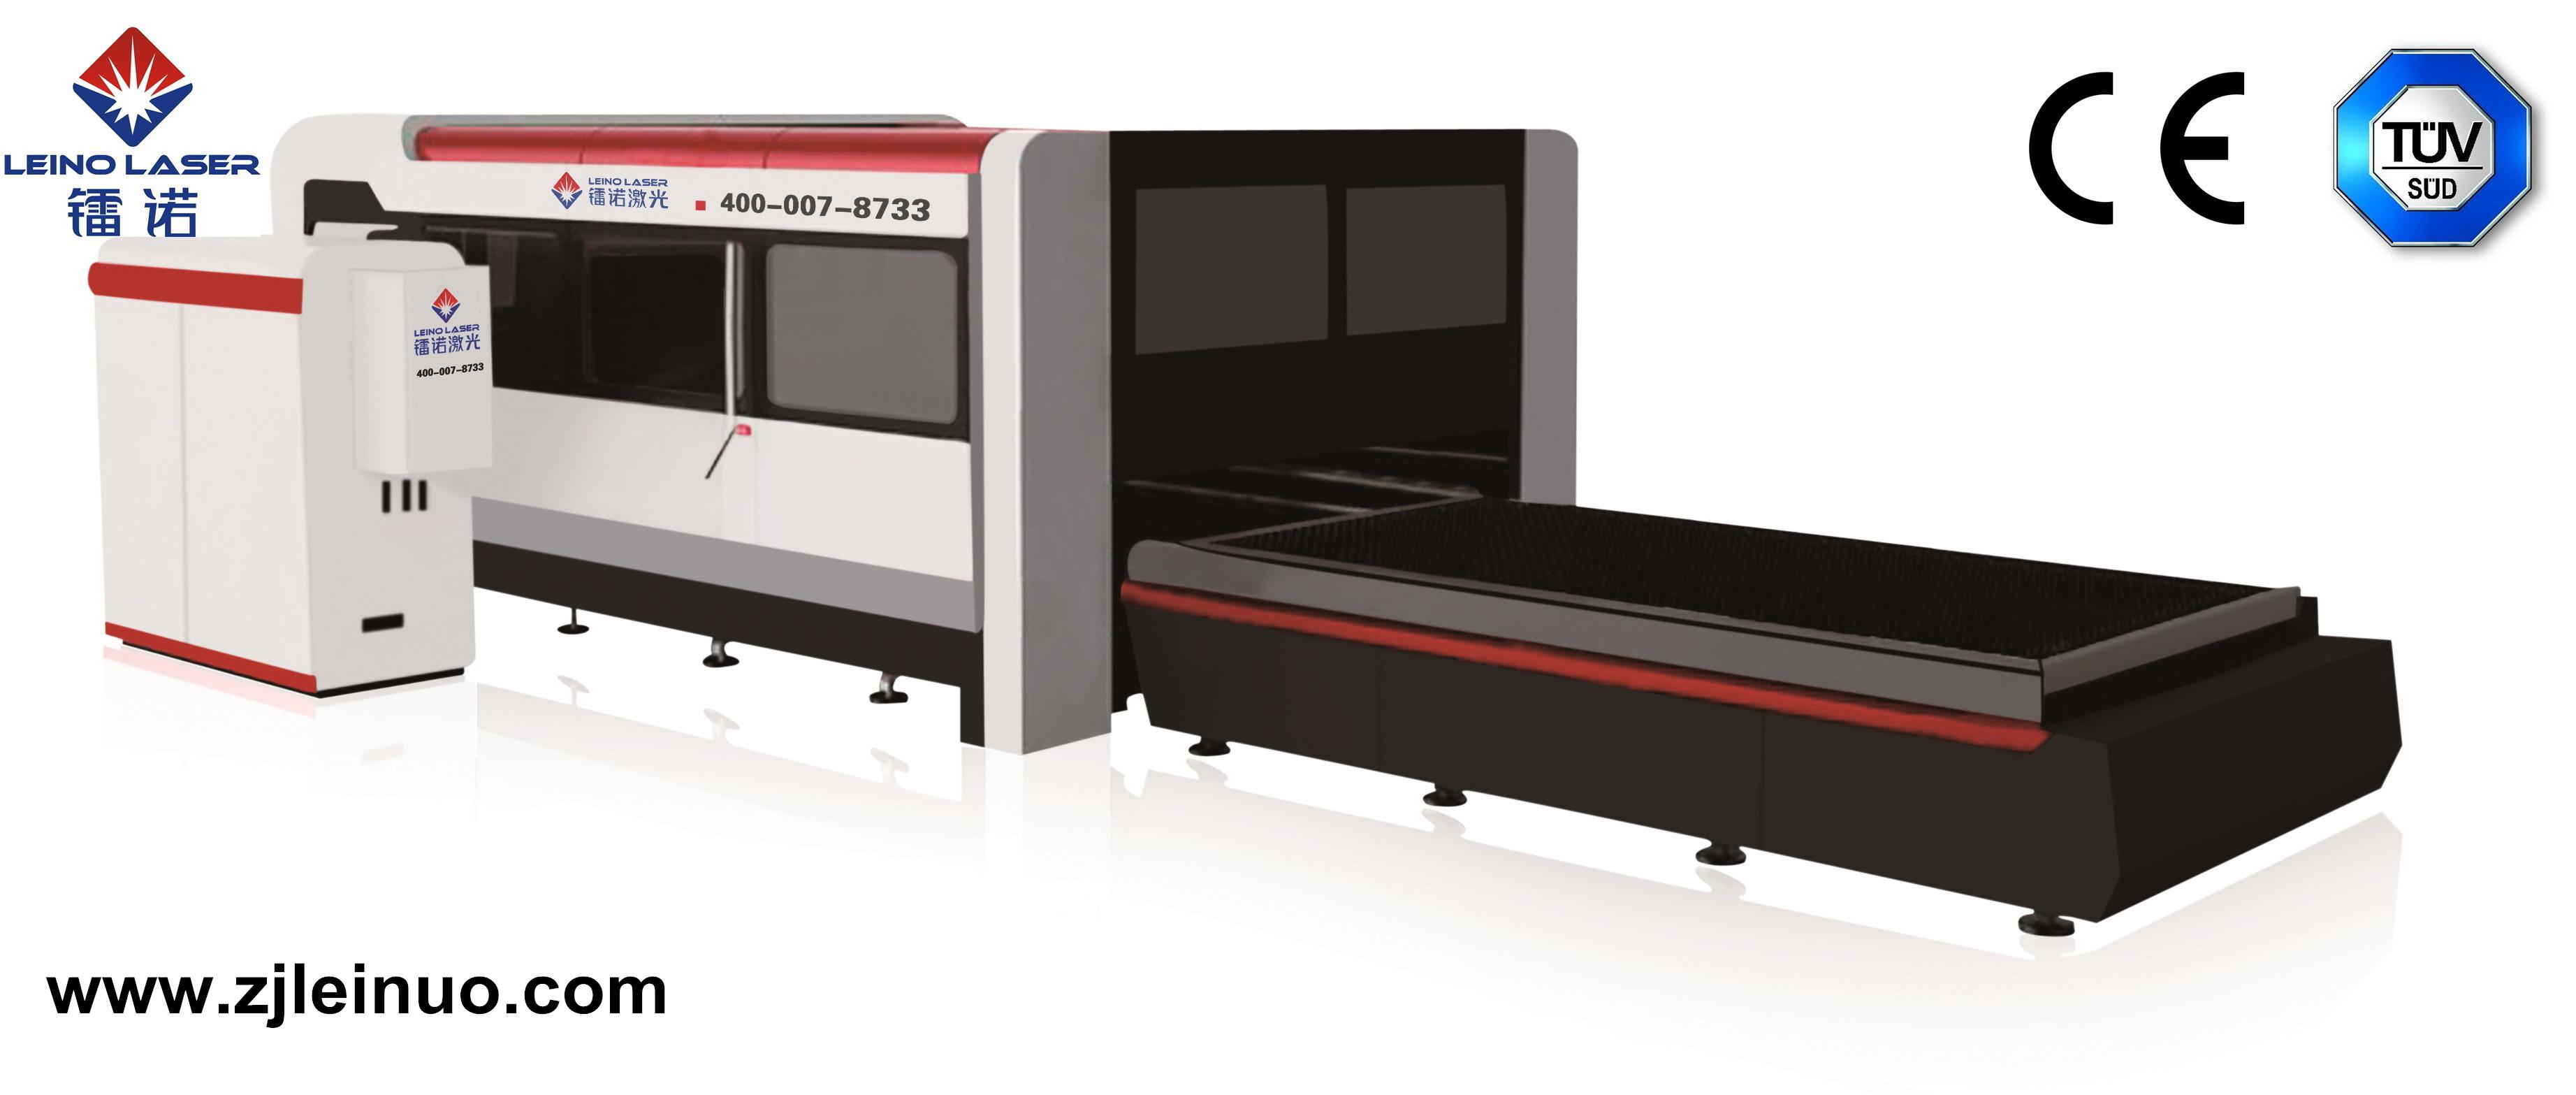 1000W CNC Exchange Platform Laser Cutting Machine for Metal